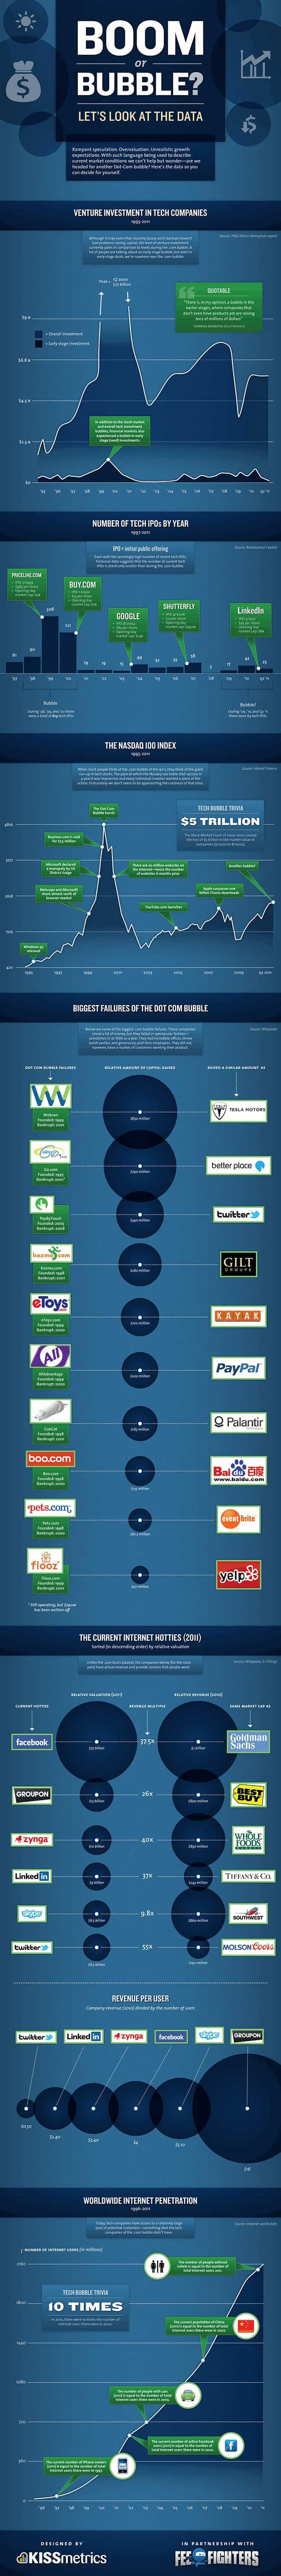 boom o burbuja tecnologica